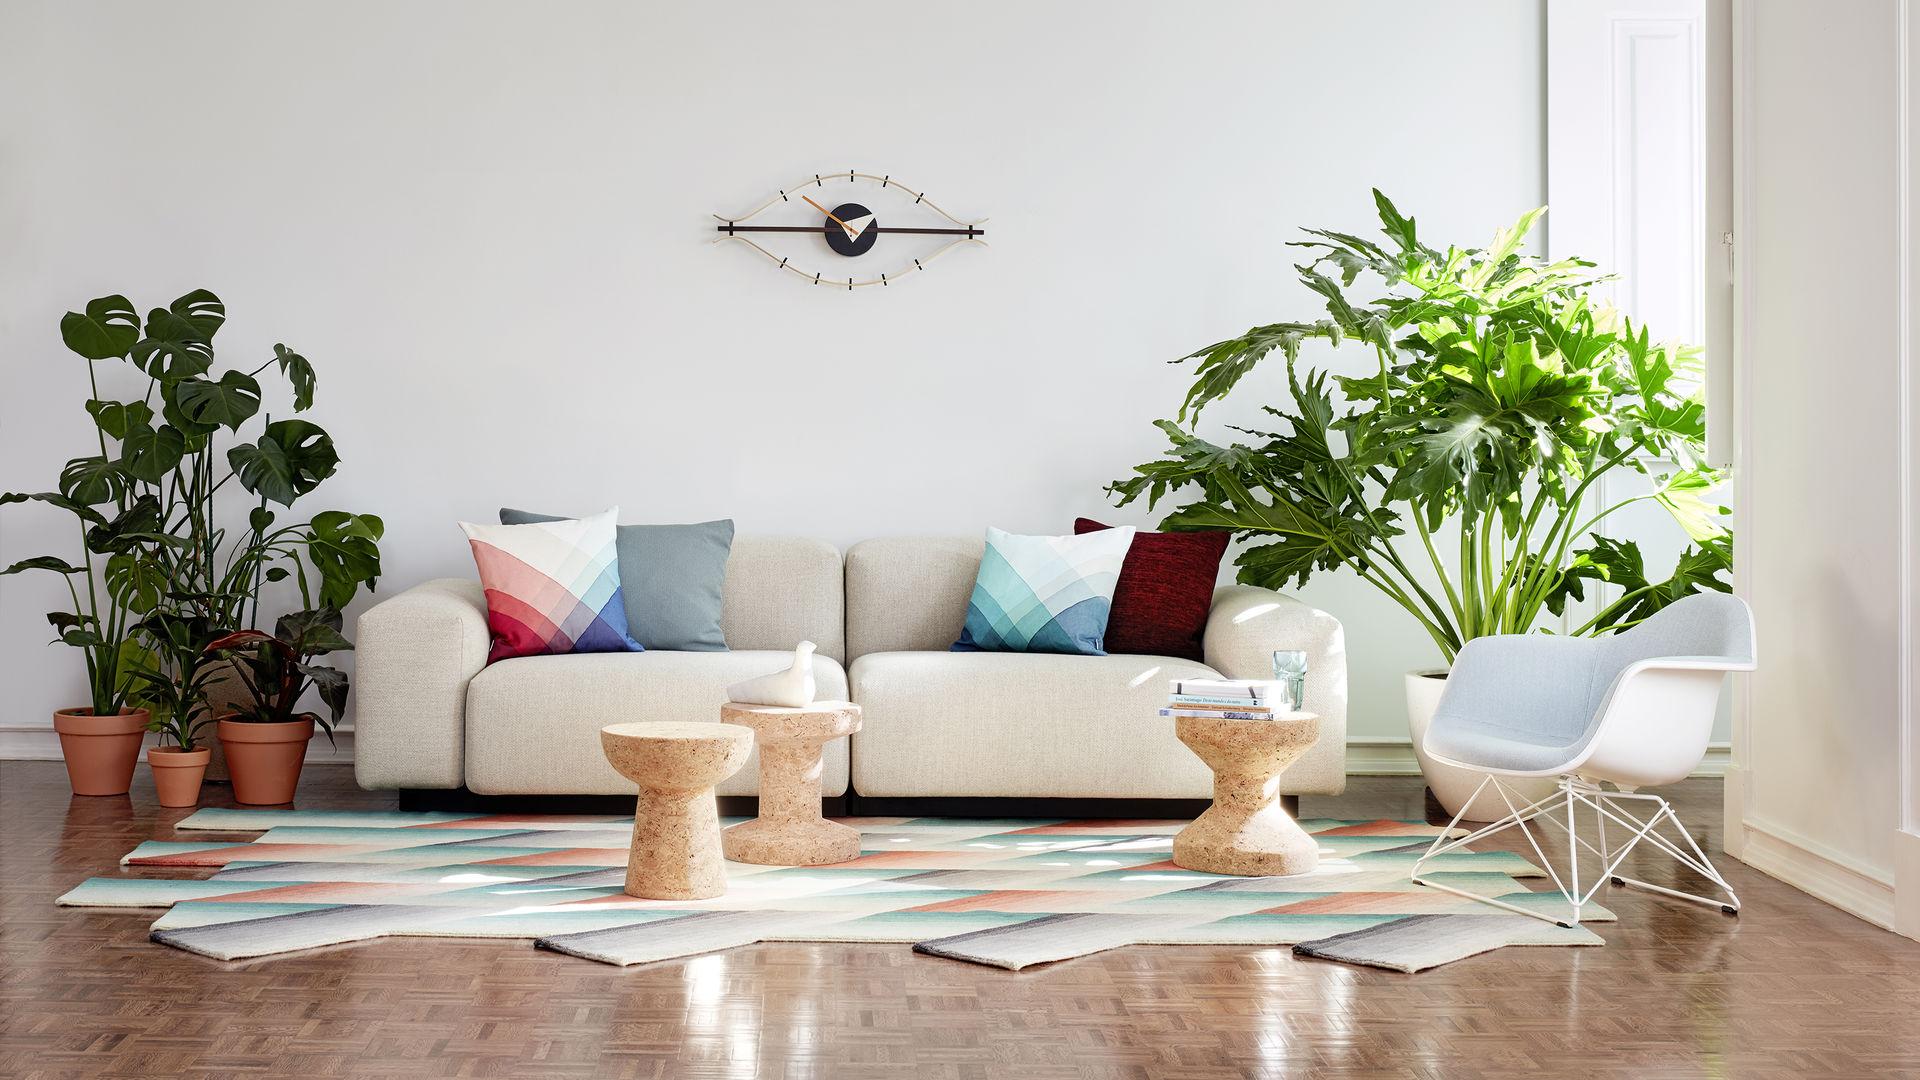 Soft Modular Sofa Eames Plastic Armchair LAR Eye Clock Herringbone Pillows L'oiseau marble Cork stools_web_16-9